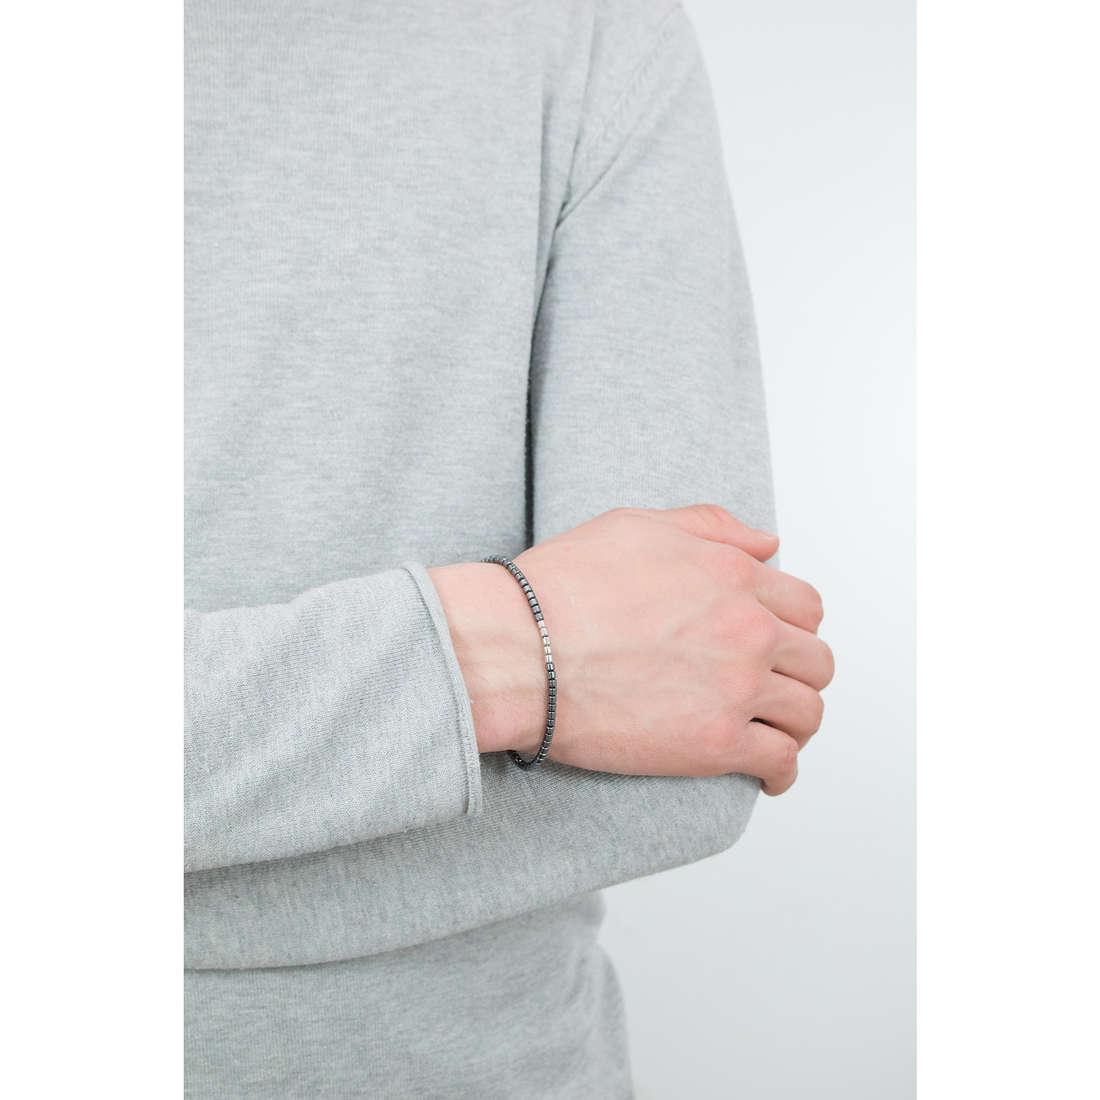 Morellato bracciali Ematite uomo SAHT09 indosso